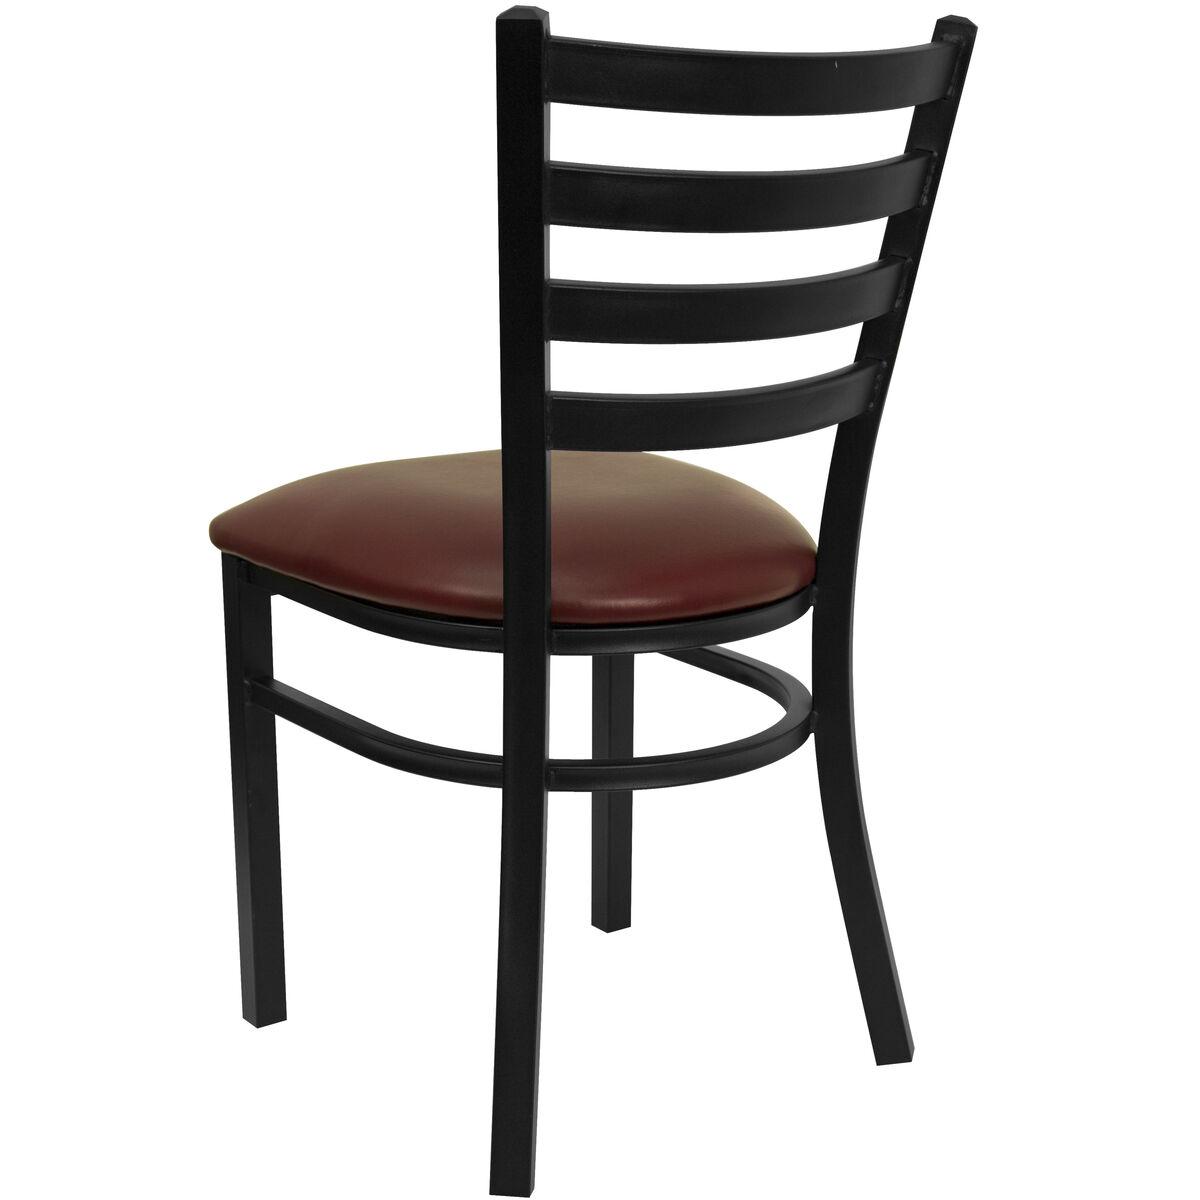 Black Ladder Chair Burg Seat Bfdh 6147ladby Tdr